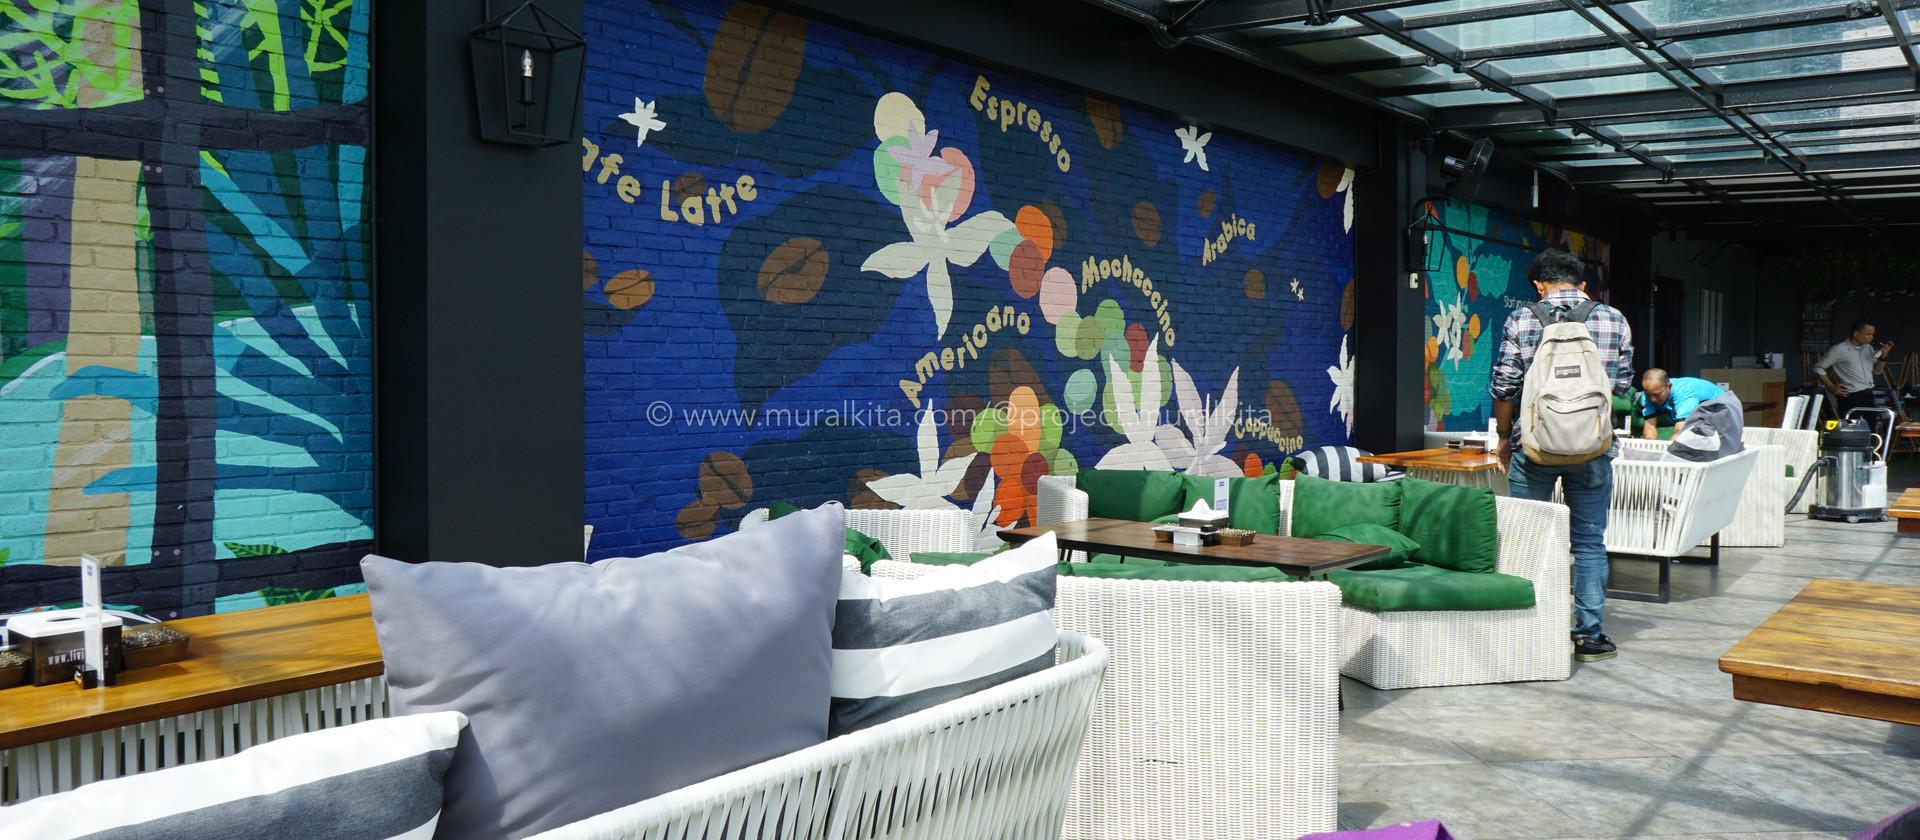 Kyriad Muraya Hotel - Spot 3